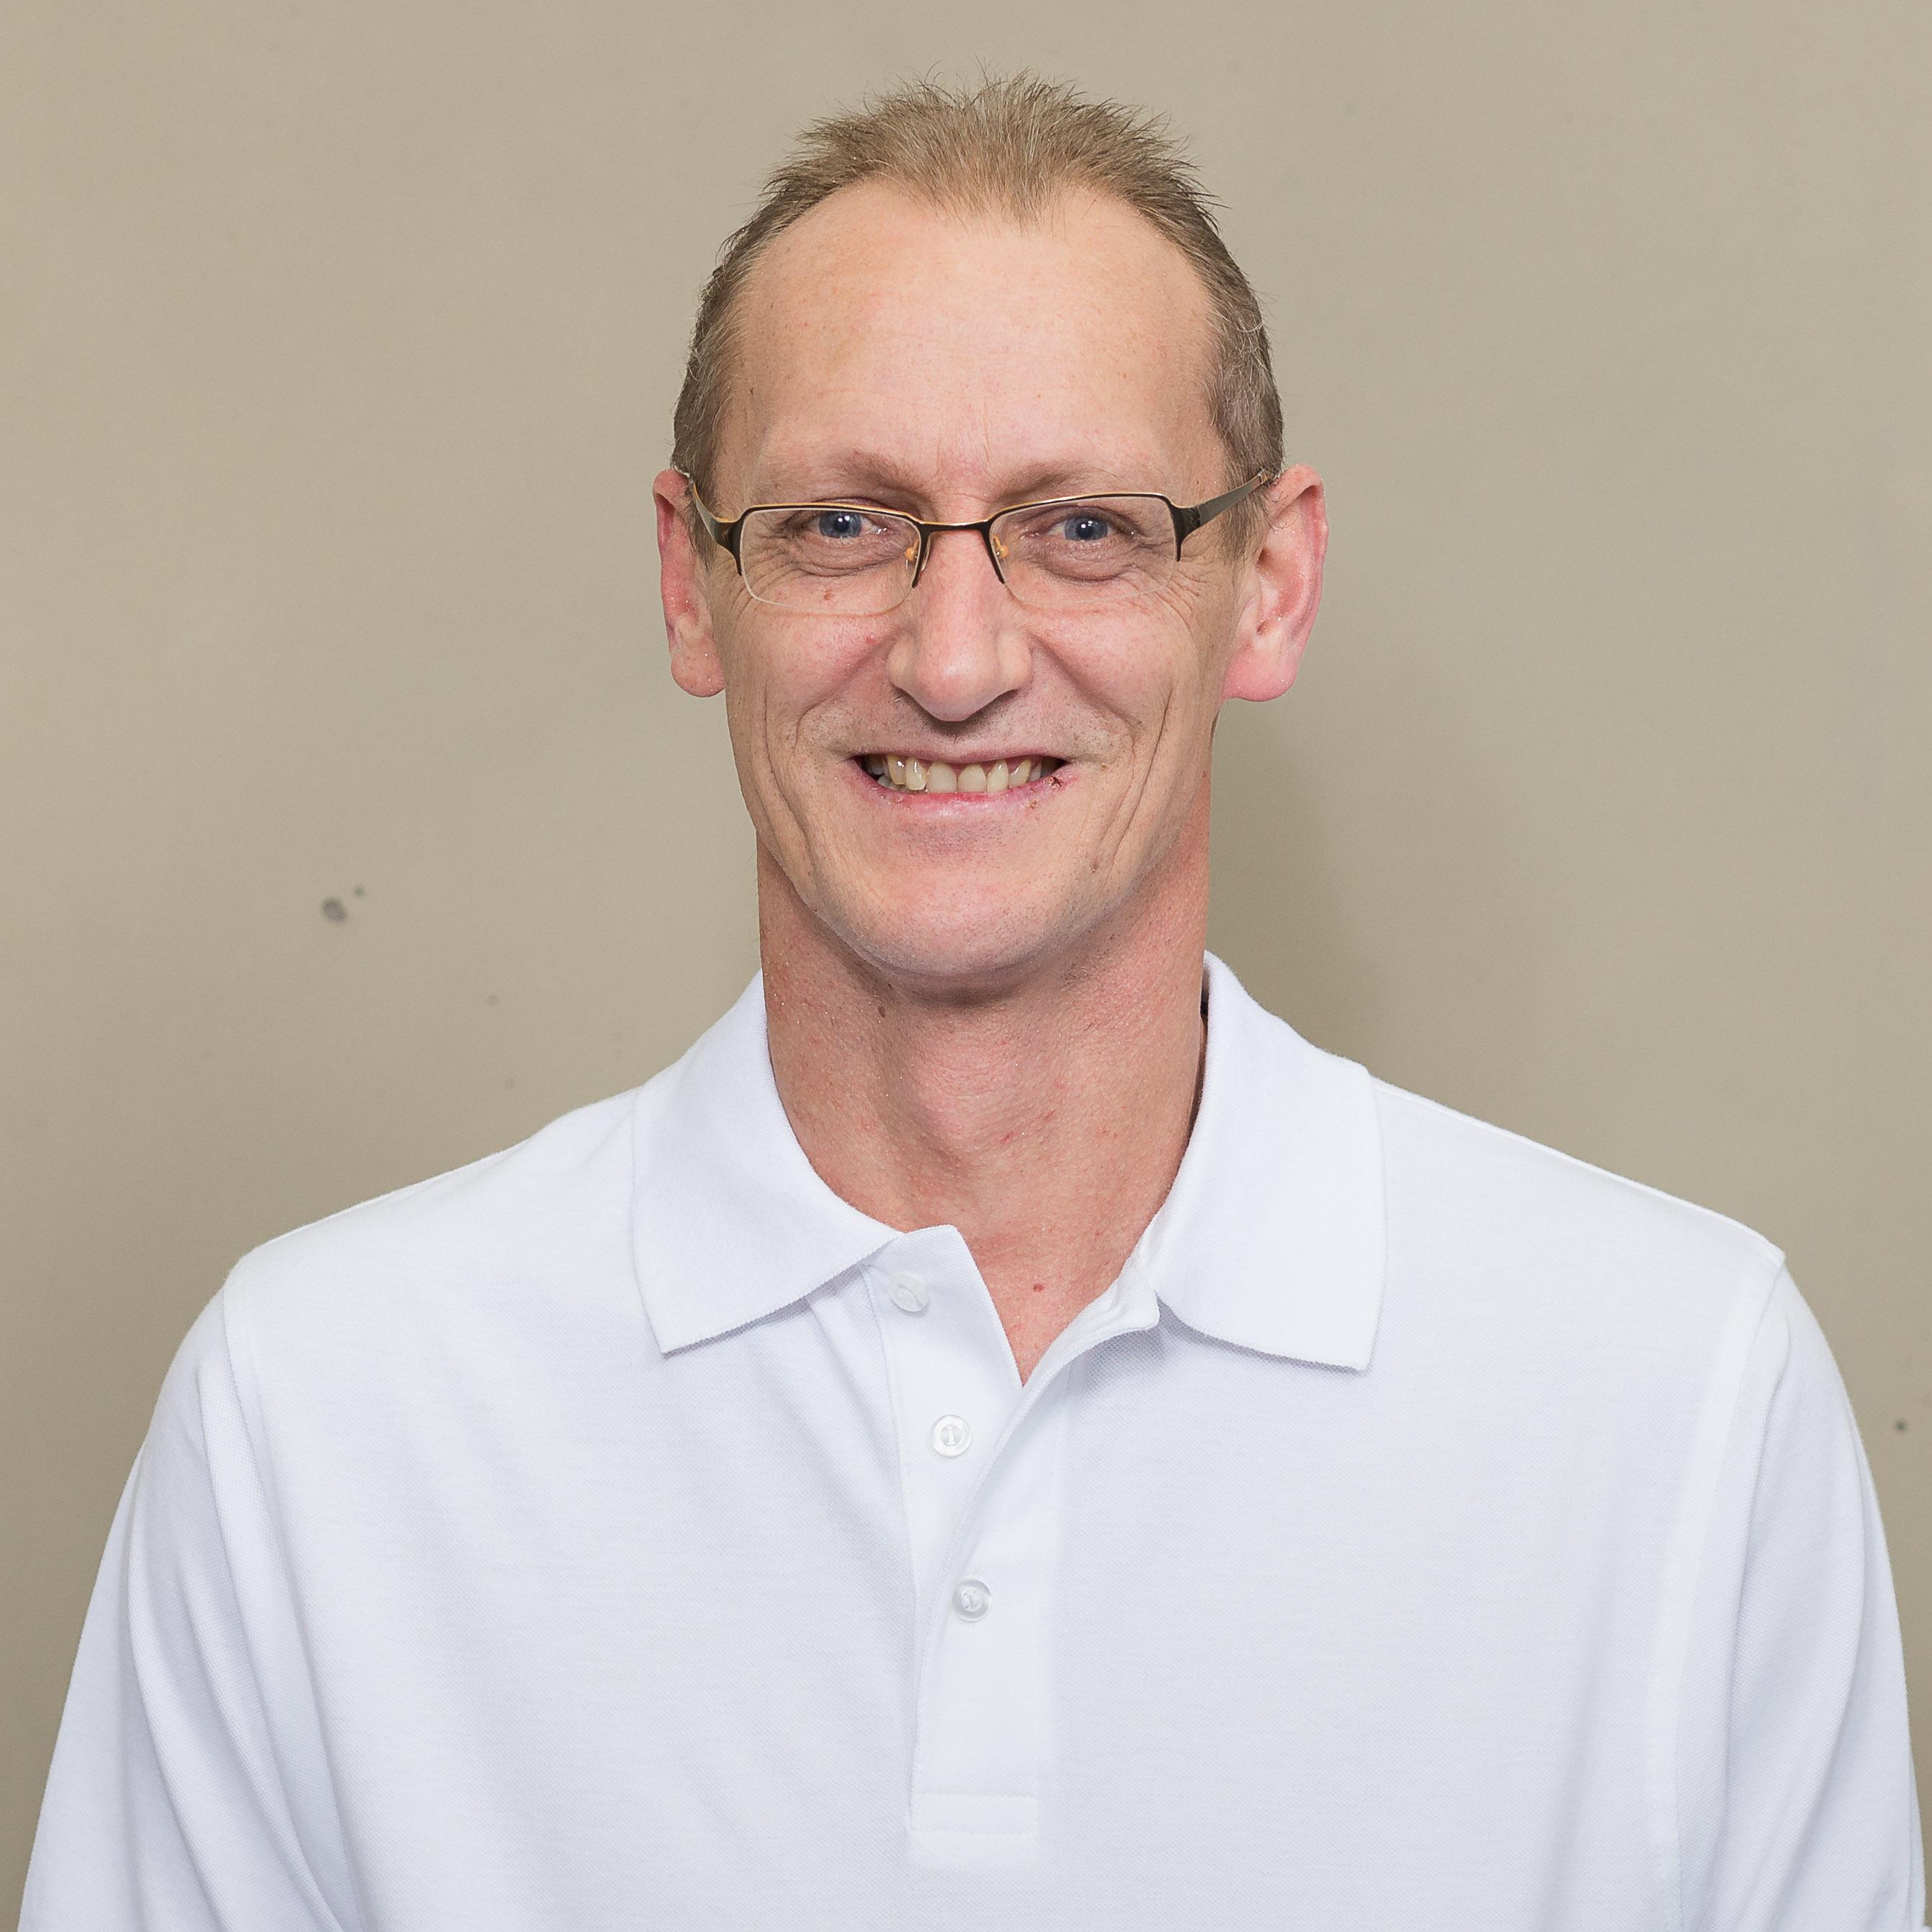 Jörg Cyron